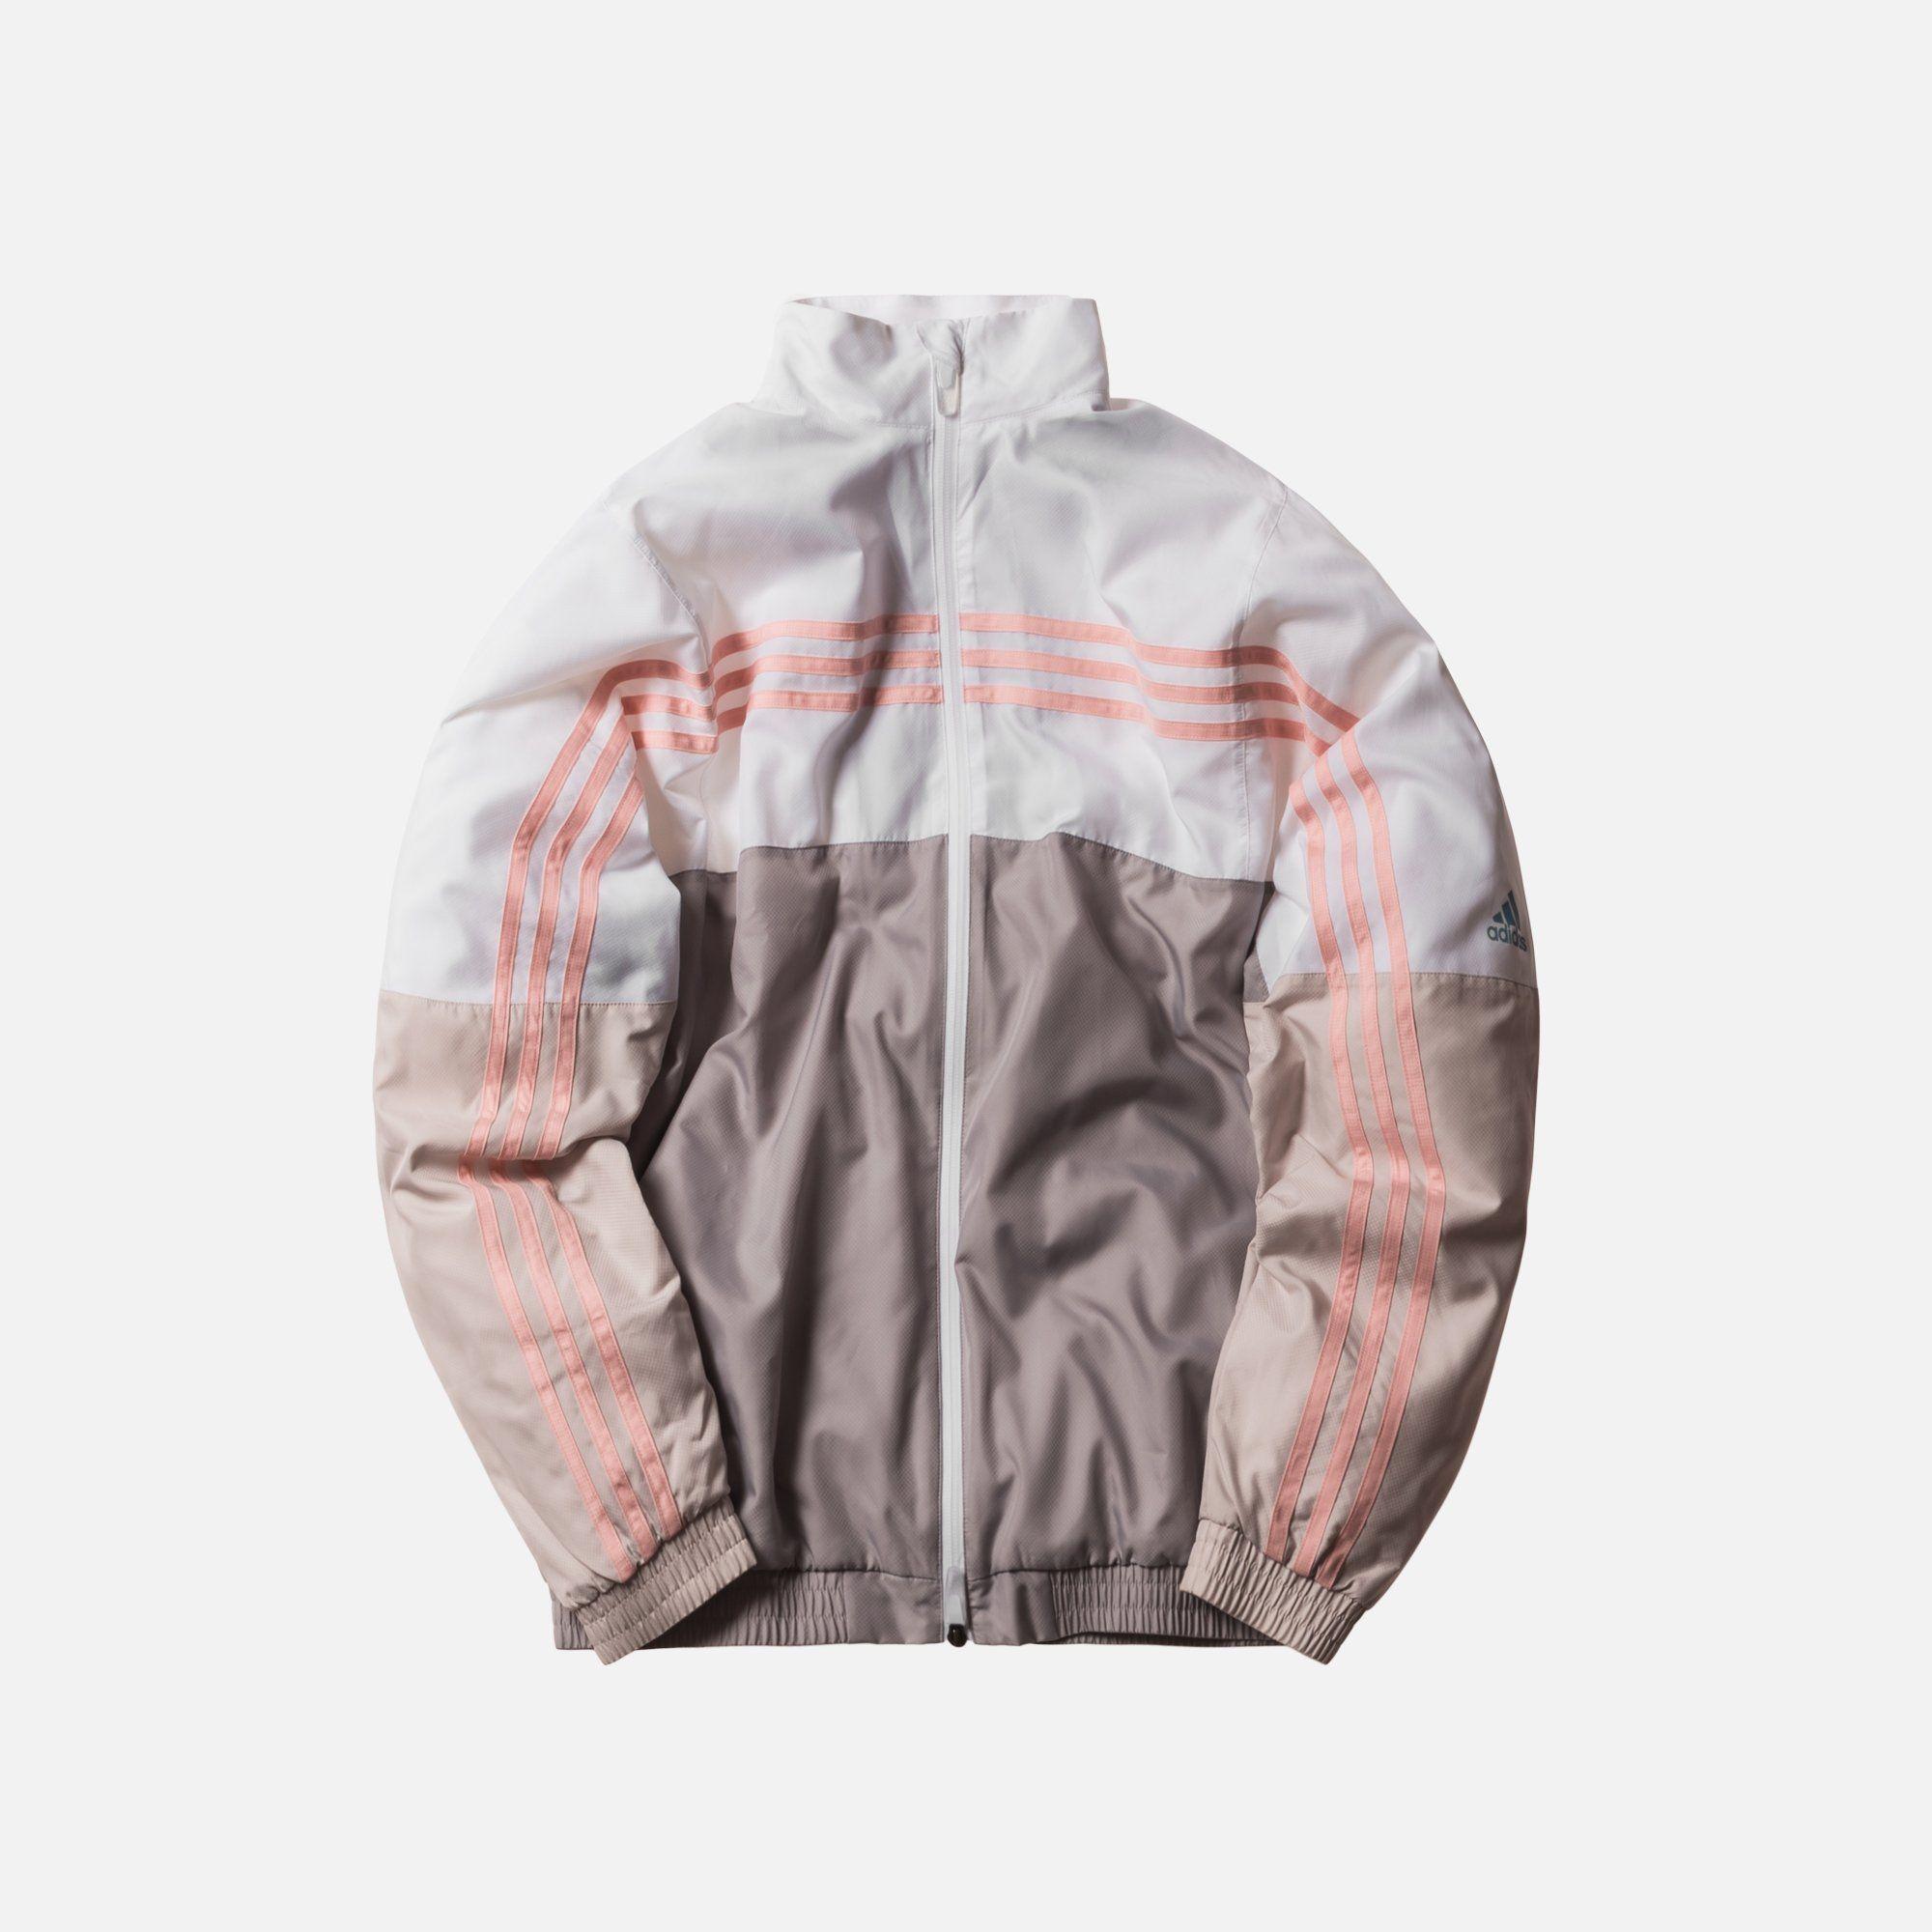 Kith X Adidas Flamingos Track Jacket